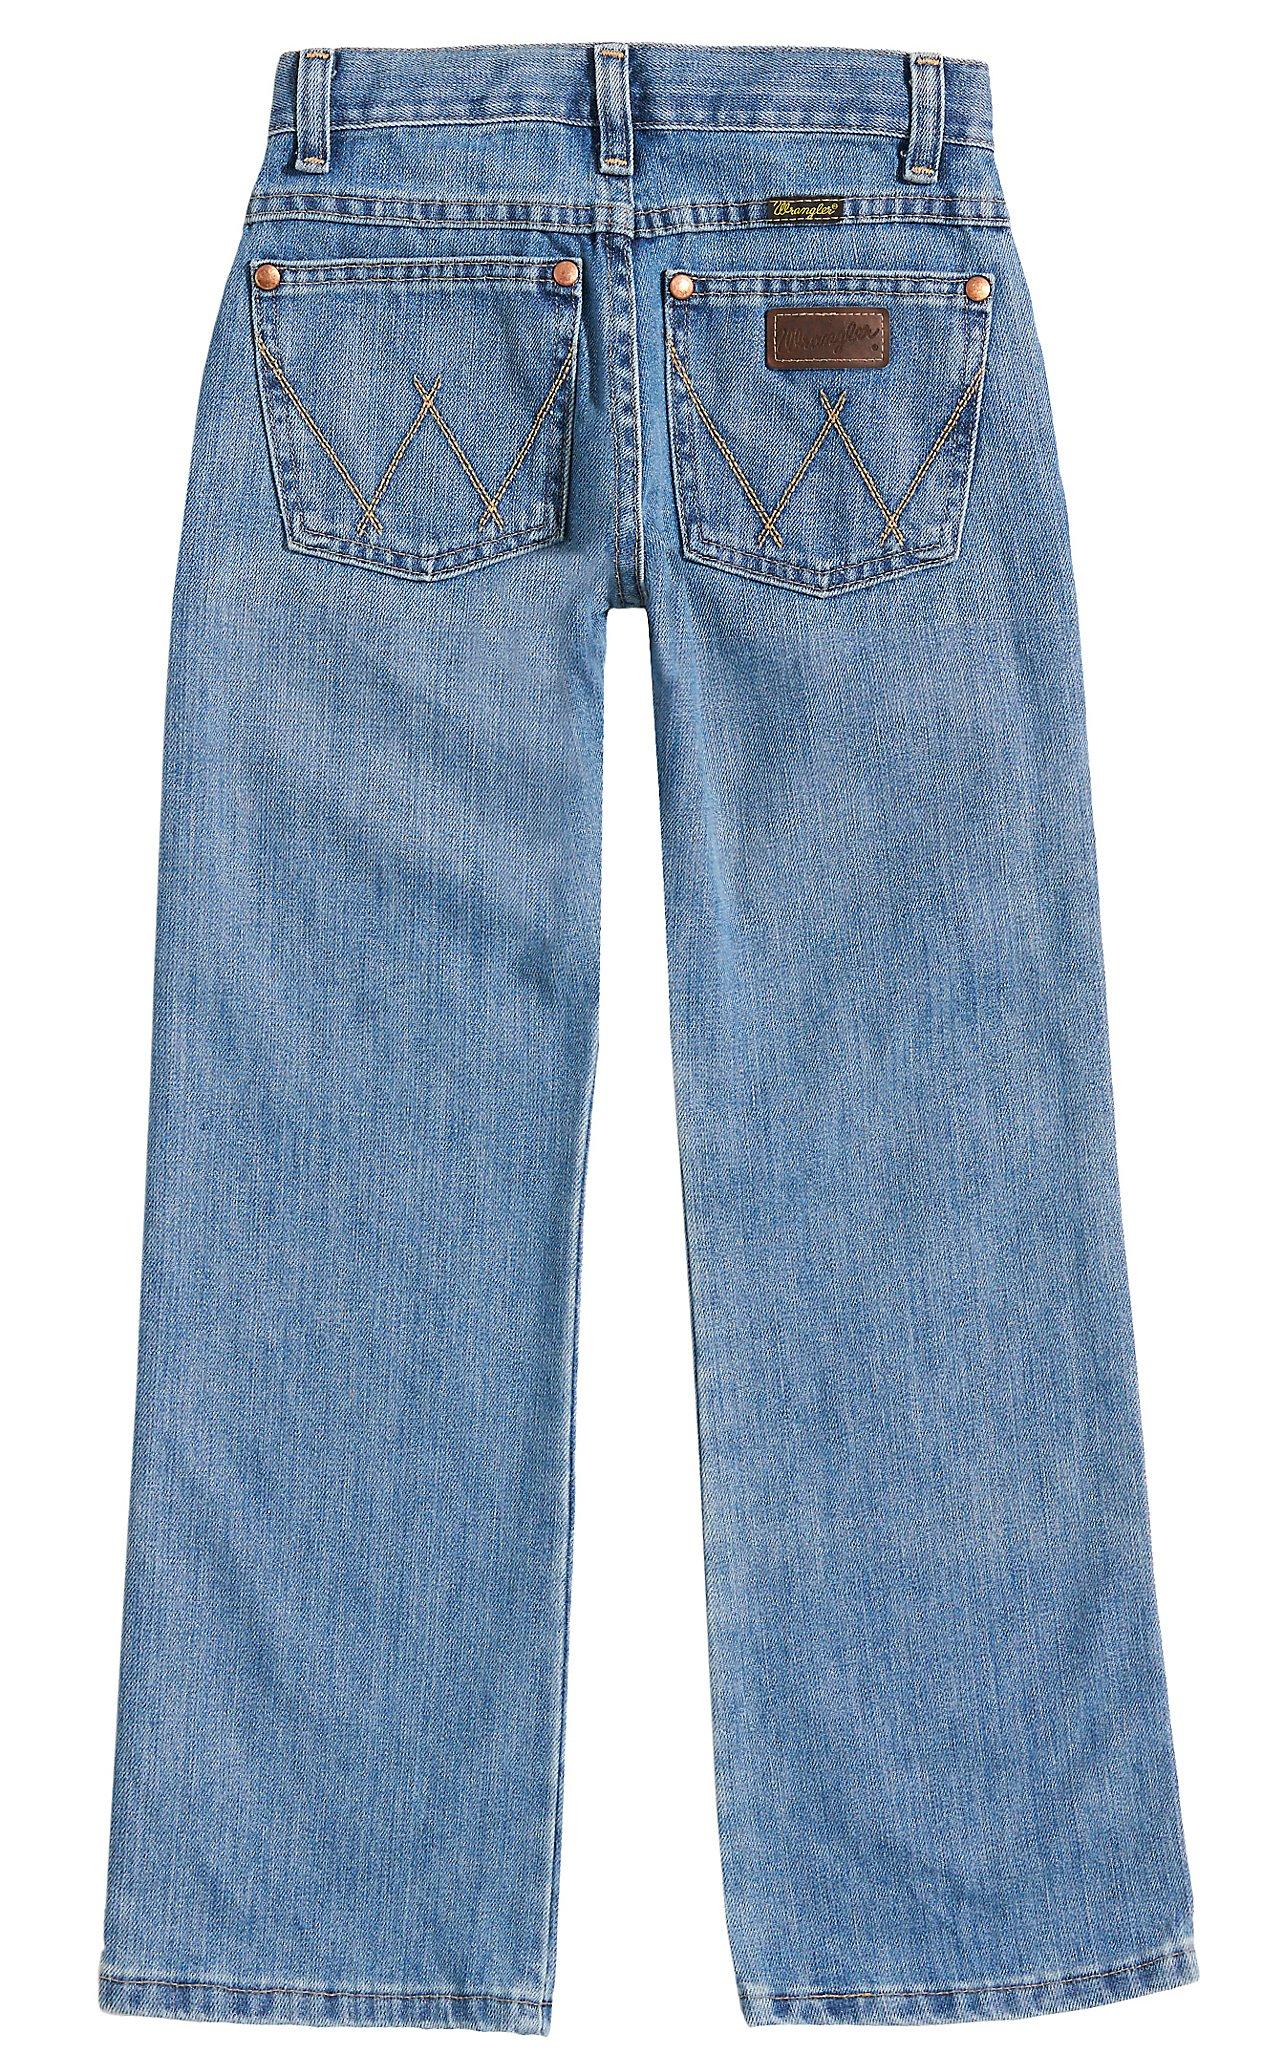 Shop Boys Western Jeans & Kids Jeans | Cavender's